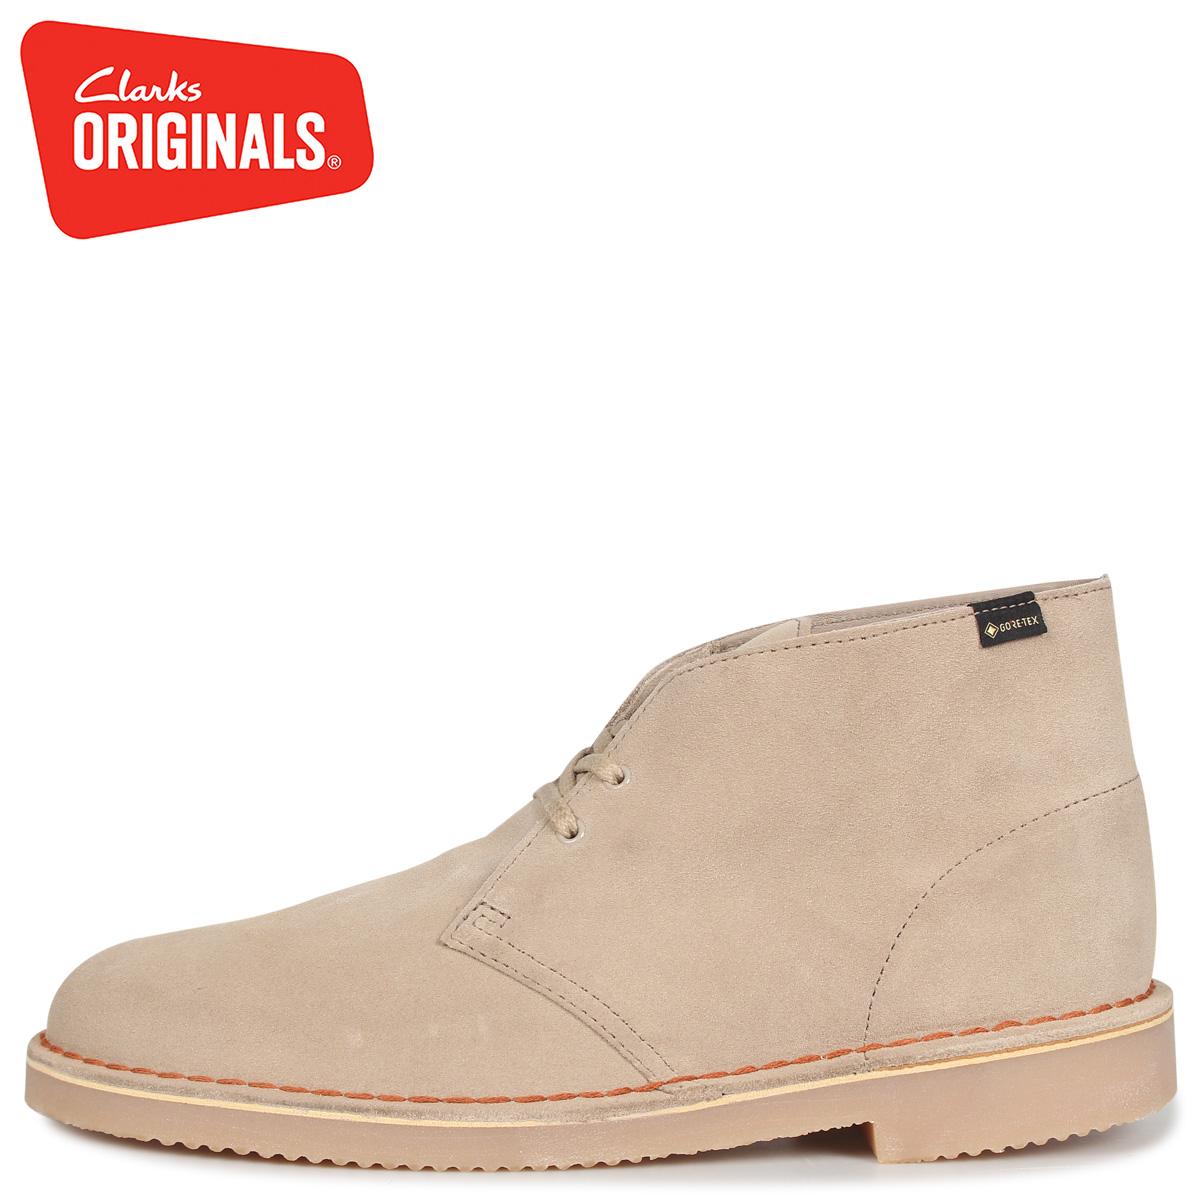 official shop presenting buy popular Clarks Originals kulaki originals desert boots Gore-Tex men GORETEX DESERT  BOOT GTX suede beige 26144250 [10/11 Shinnyu load]